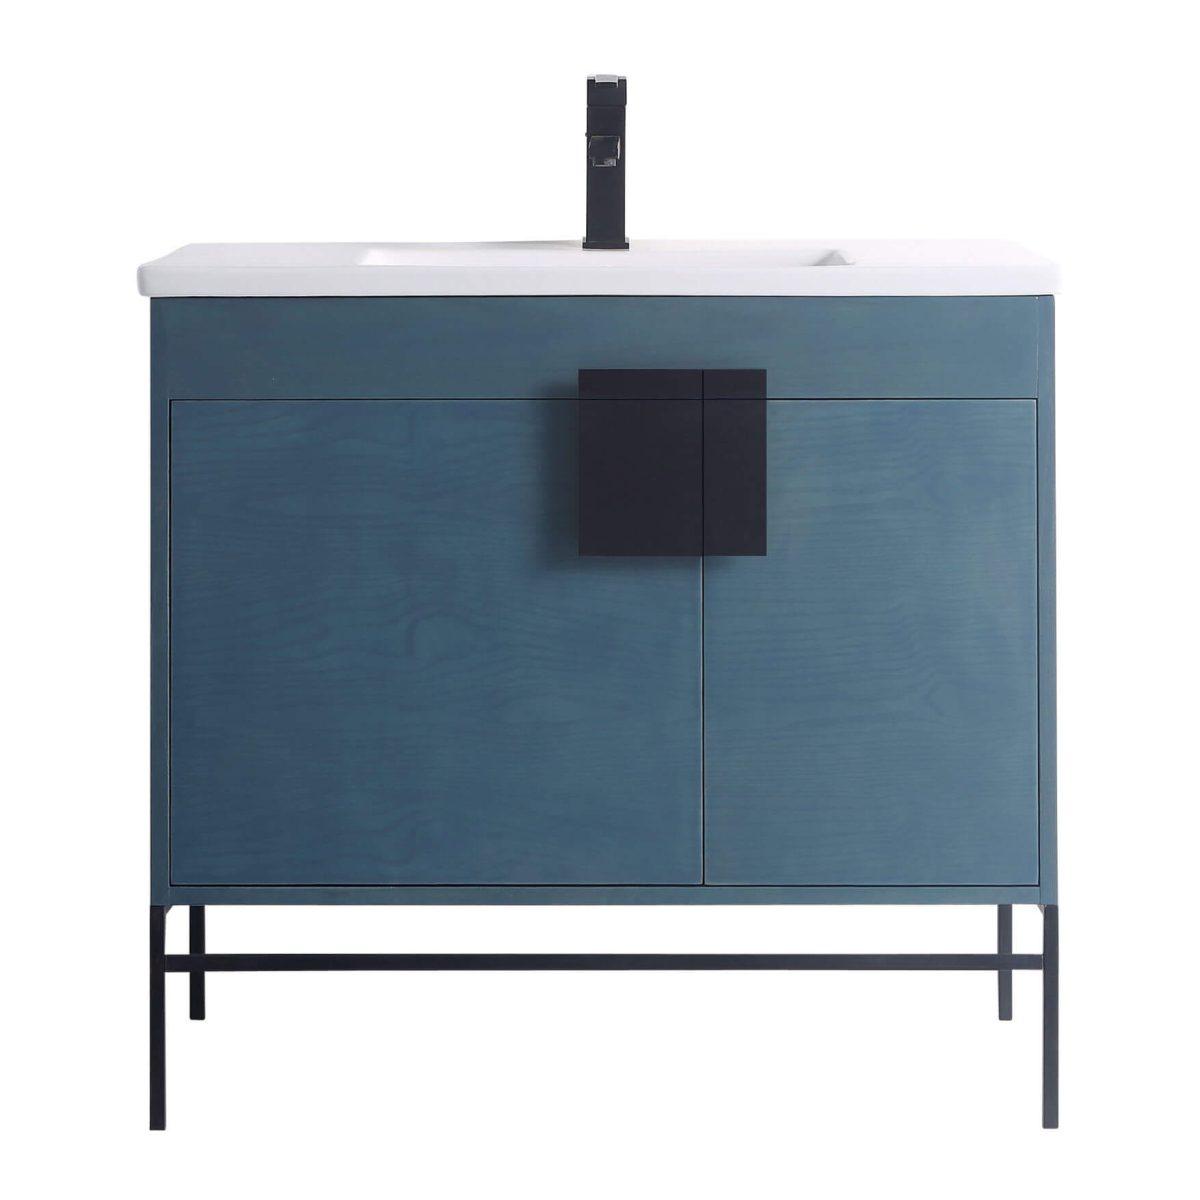 "Shawbridge 36"" Modern Bathroom Vanity  French Blue with Black Hardware"